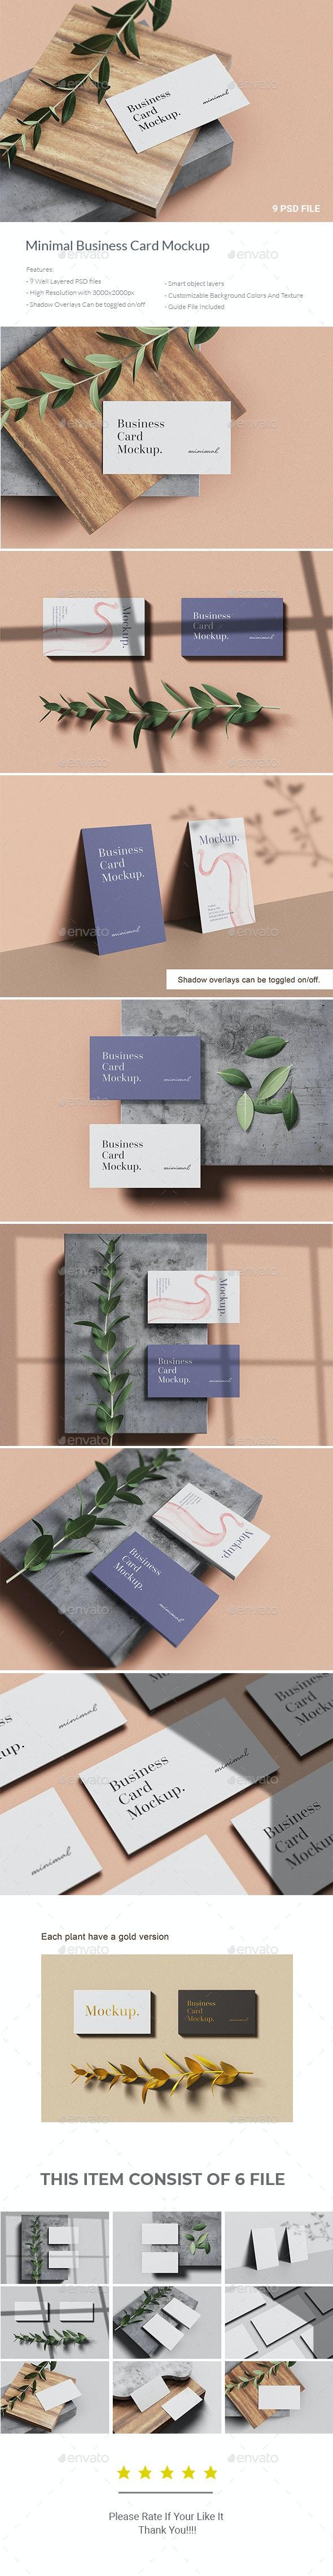 Minimal Business Card Mockup - Business Cards Print